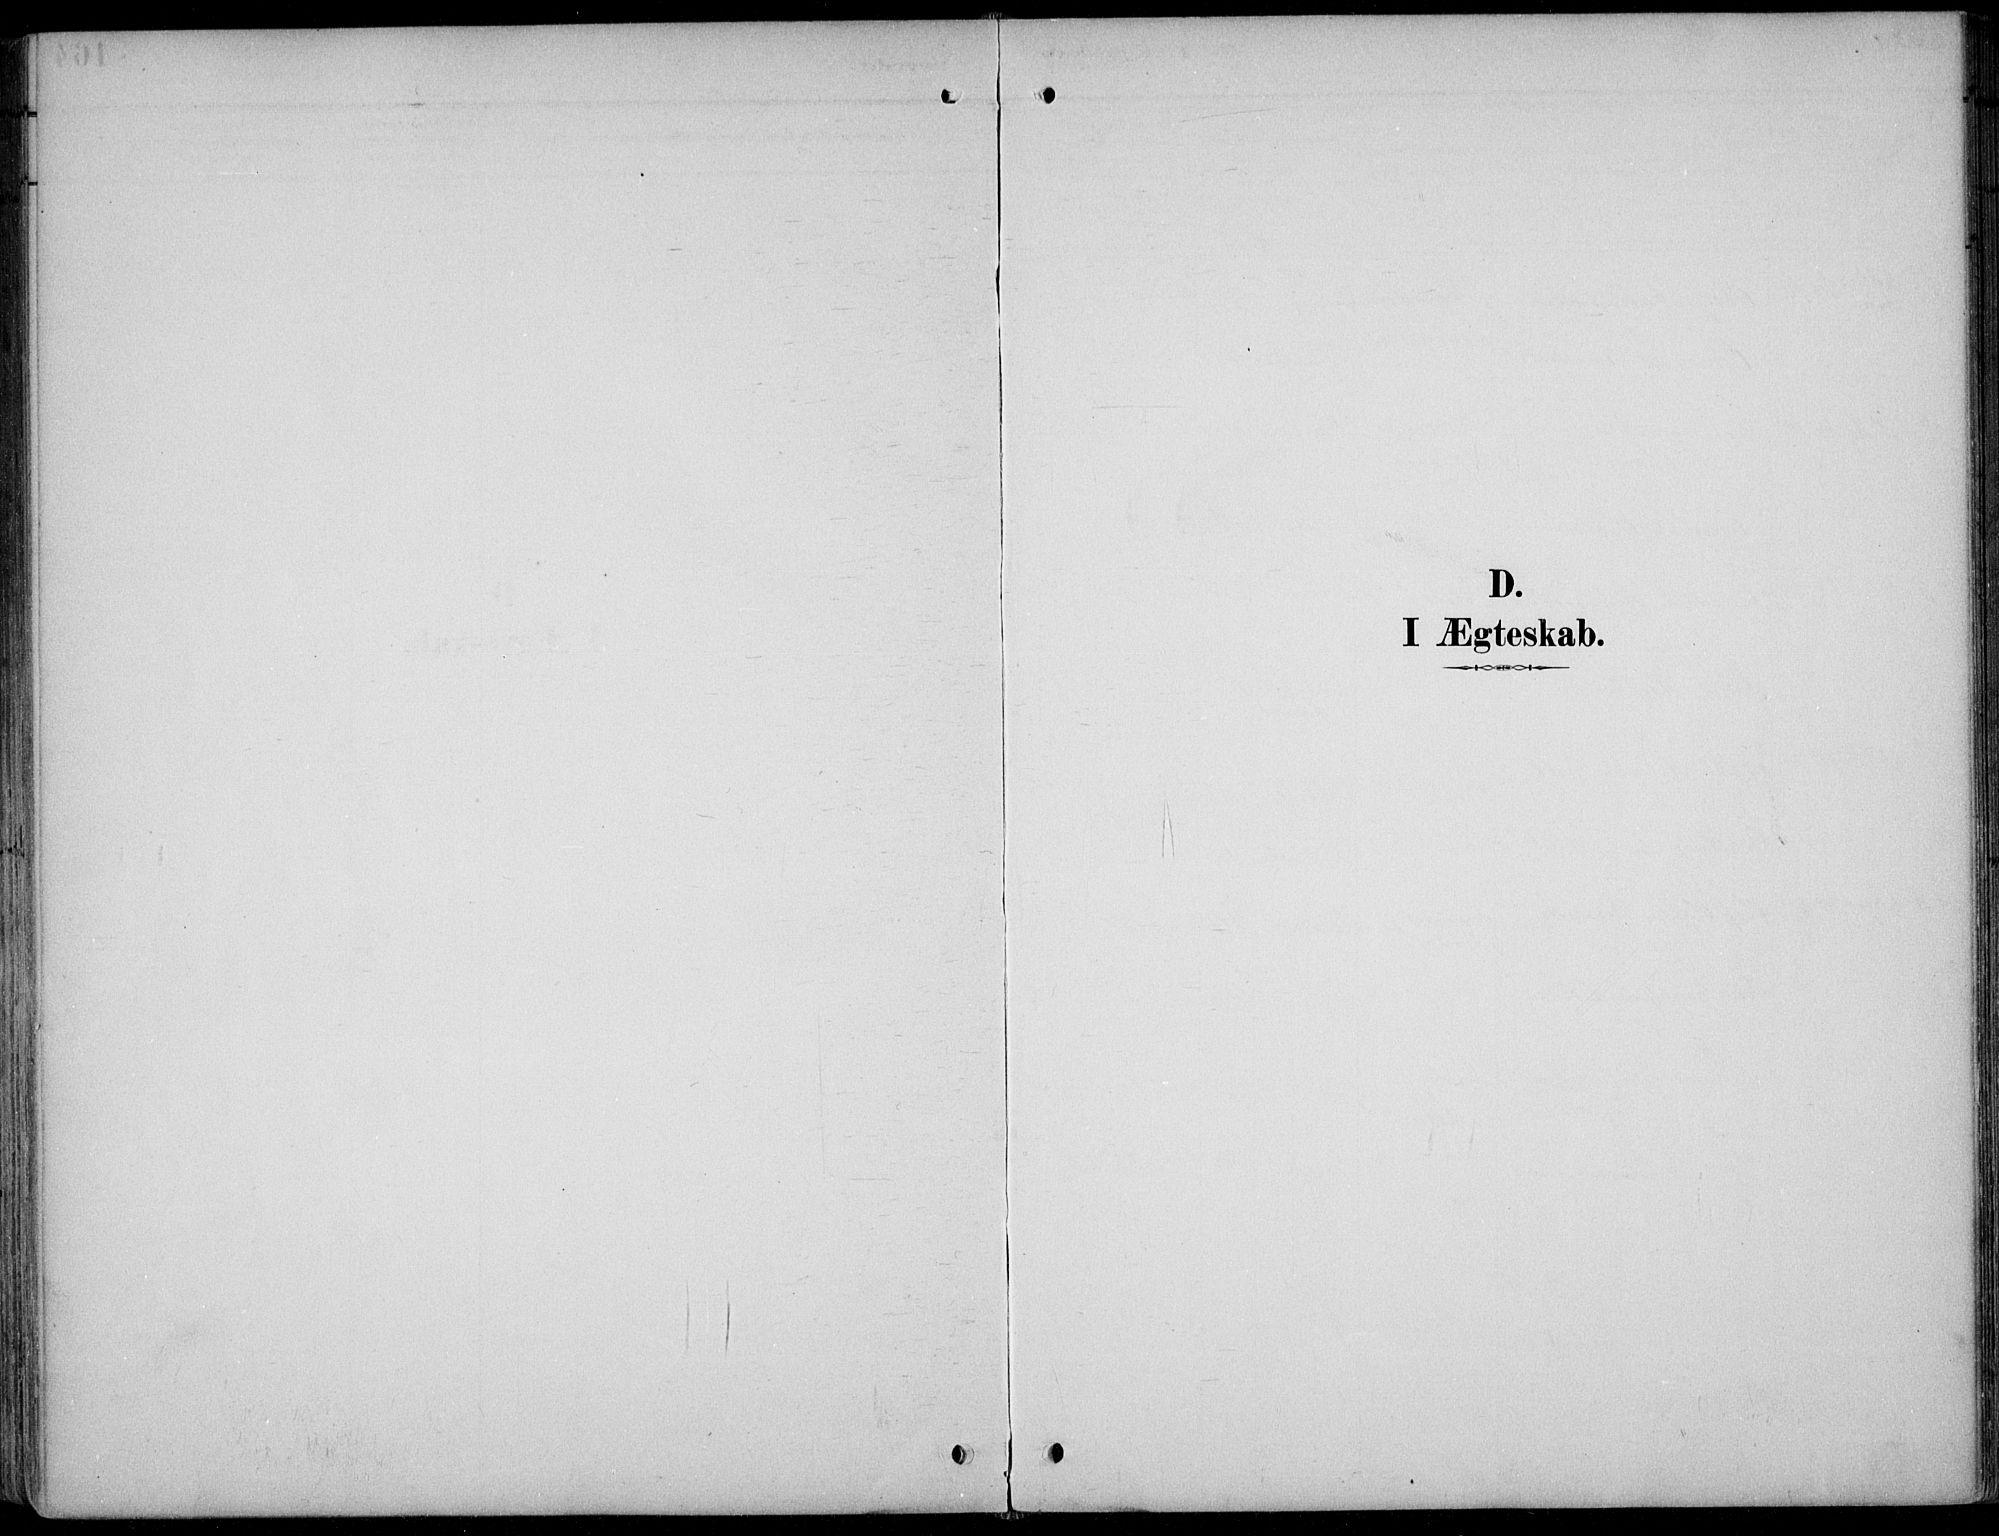 SAKO, Kviteseid kirkebøker, F/Fb/L0002: Ministerialbok nr. II 2, 1882-1916